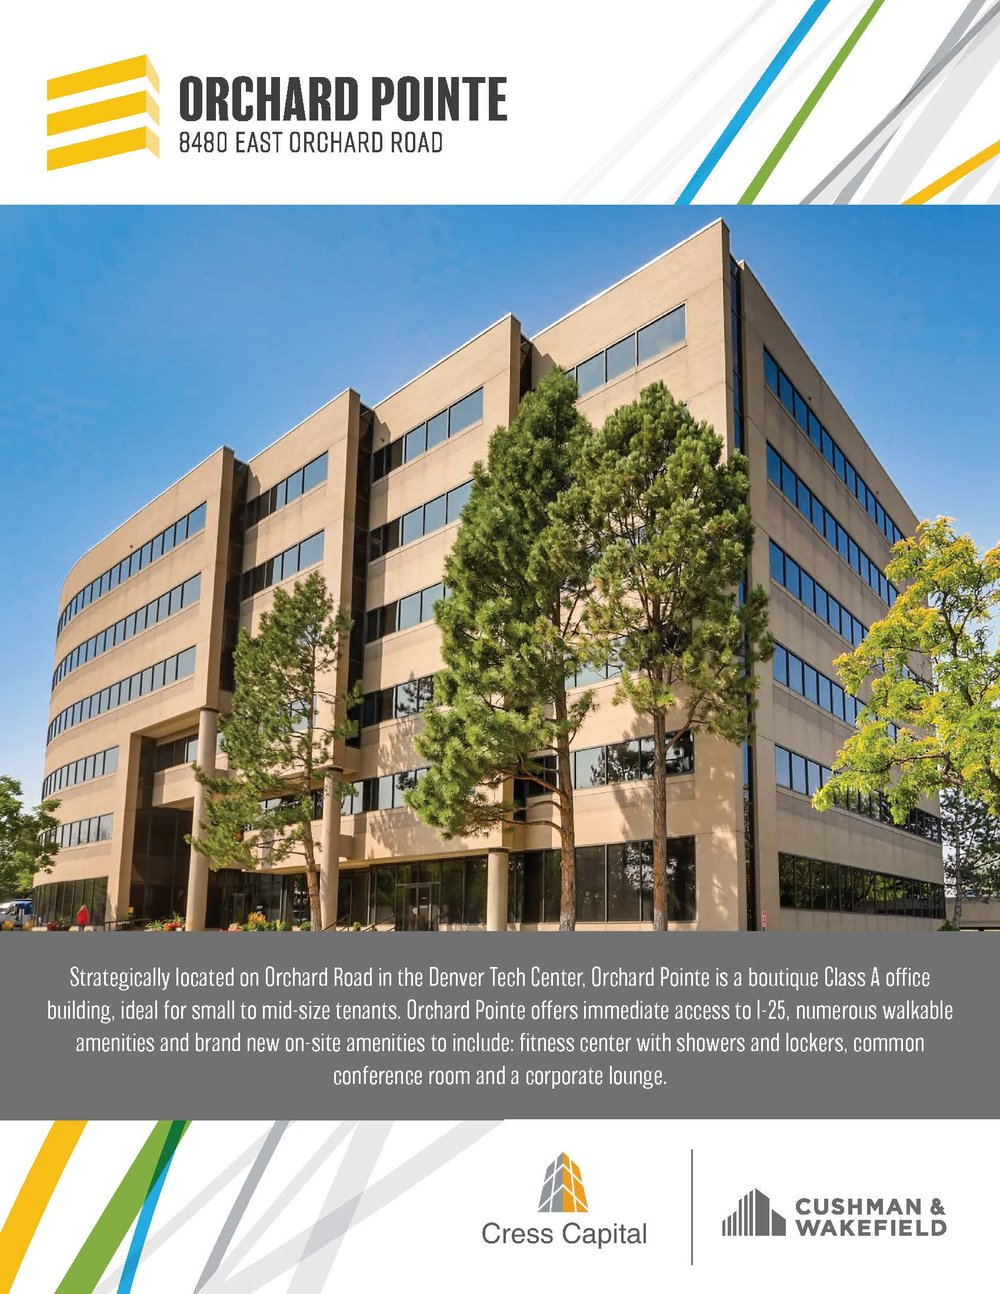 Custom Property Brochure